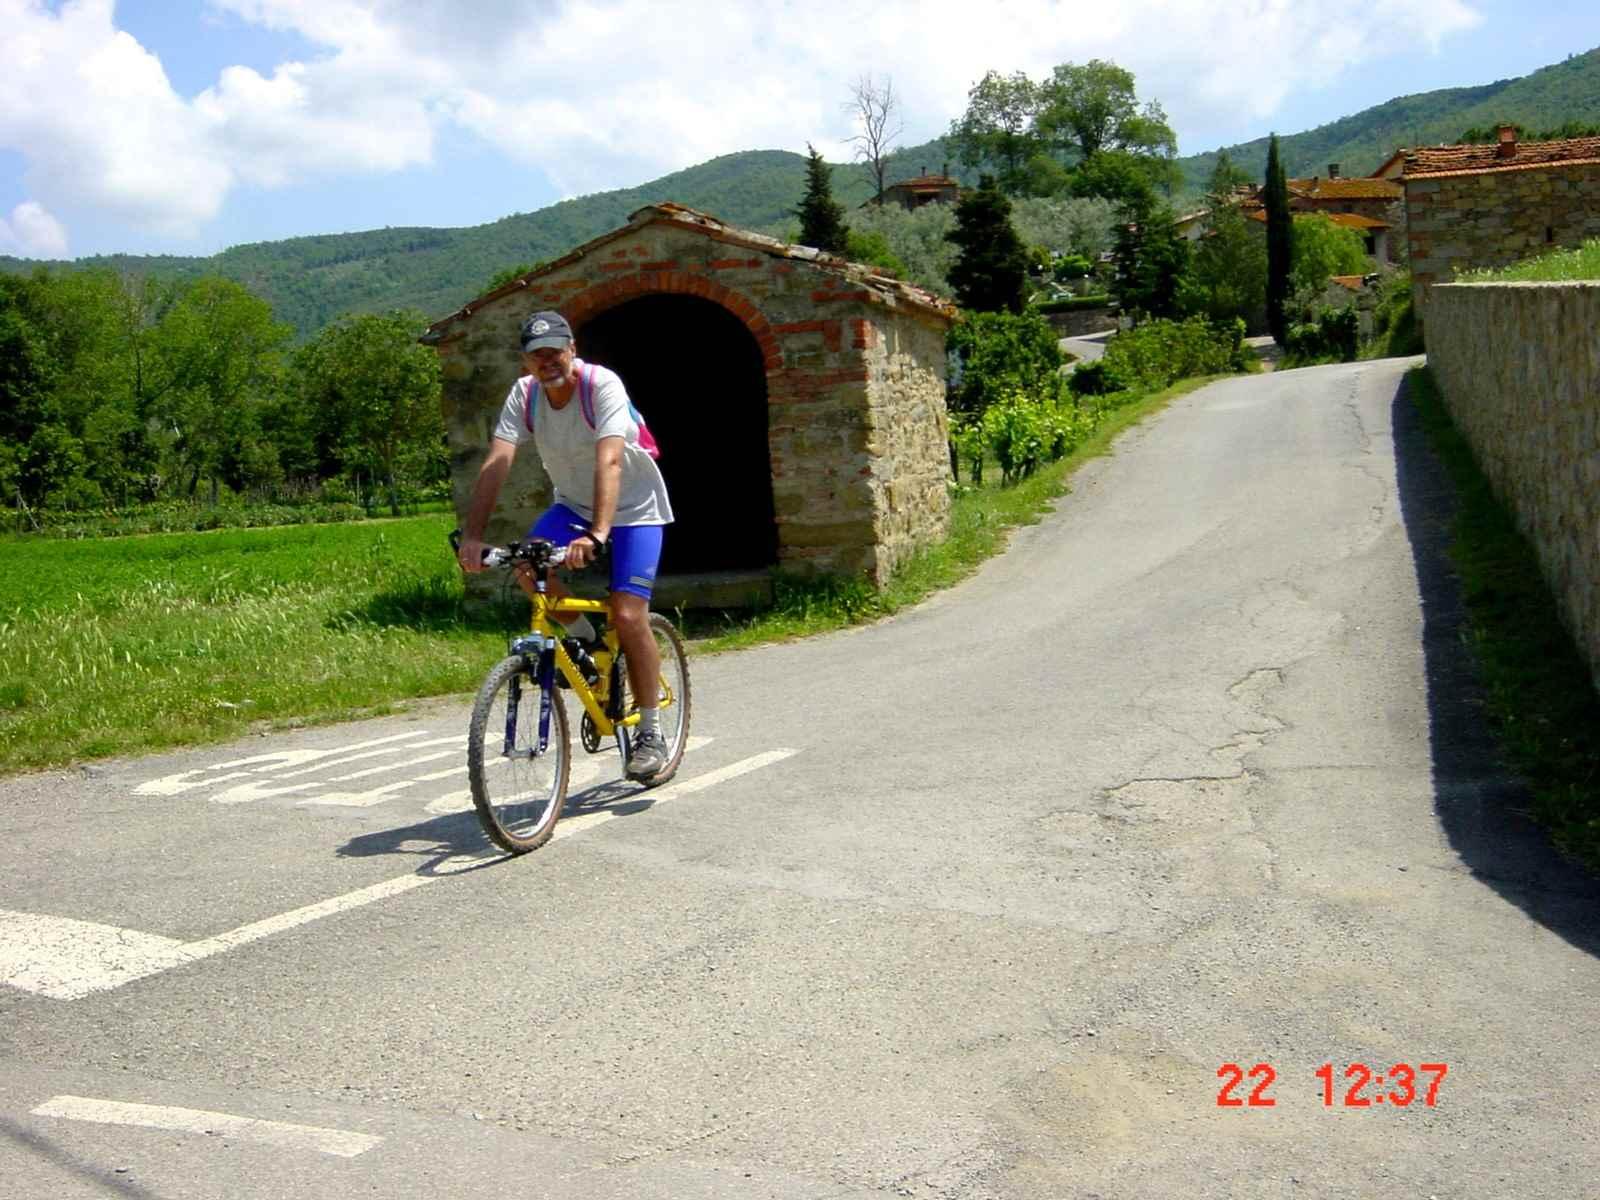 Foto 1 zur Tour: Monte Castel Giudeo, 1037 m